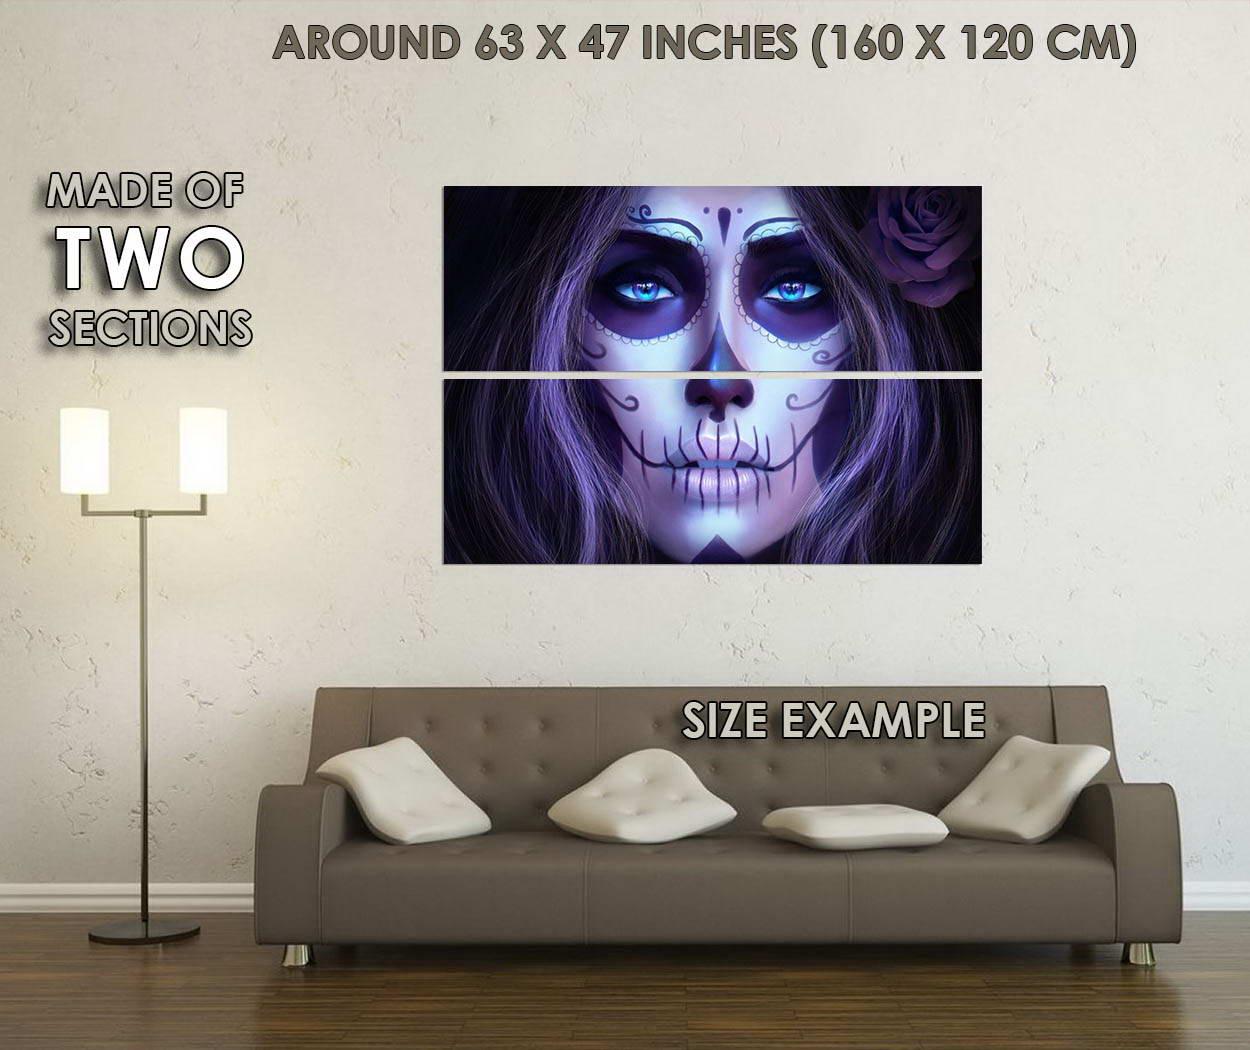 10571-Woman-Skull-Face-Fantasy-Art-LAMINATED-POSTER-CA thumbnail 6